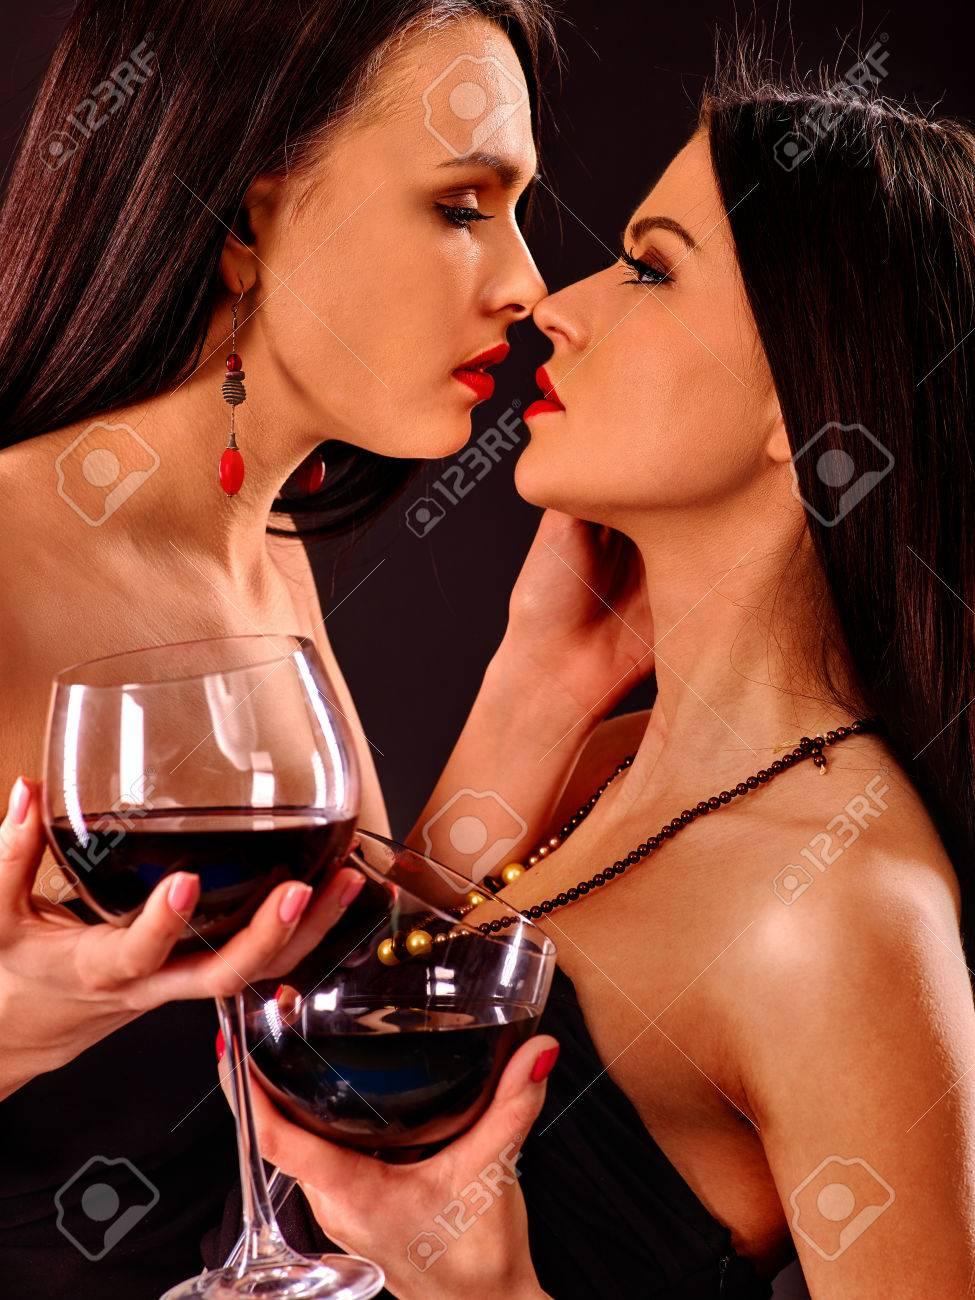 Lesbians Kissing The Shower